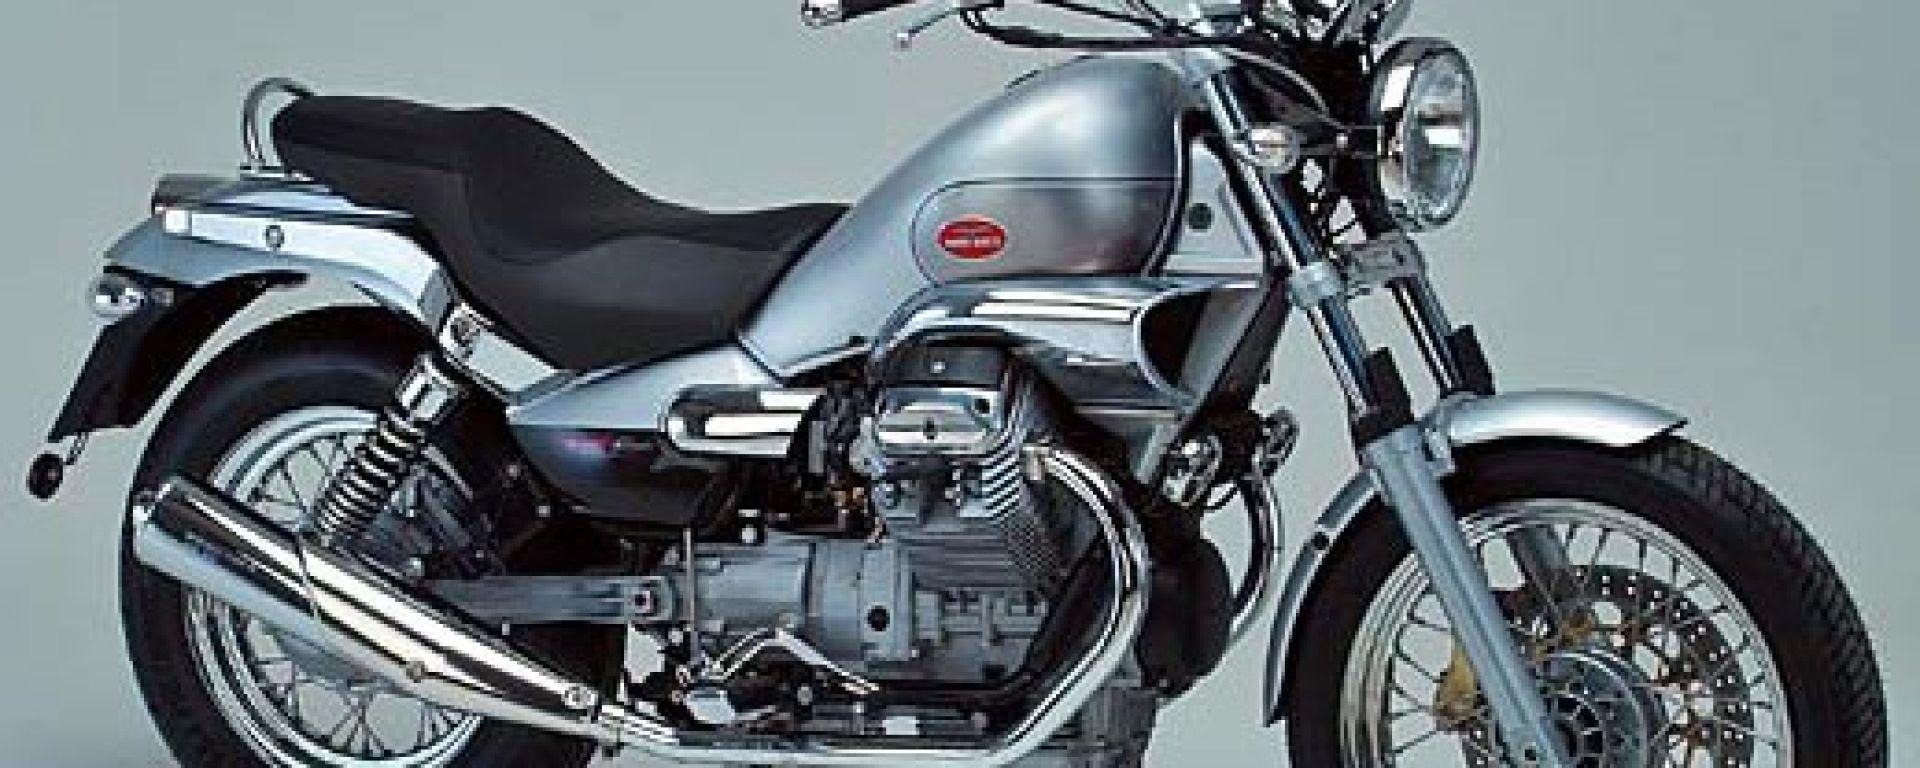 Anteprima: Moto Guzzi Nevada 750 '04